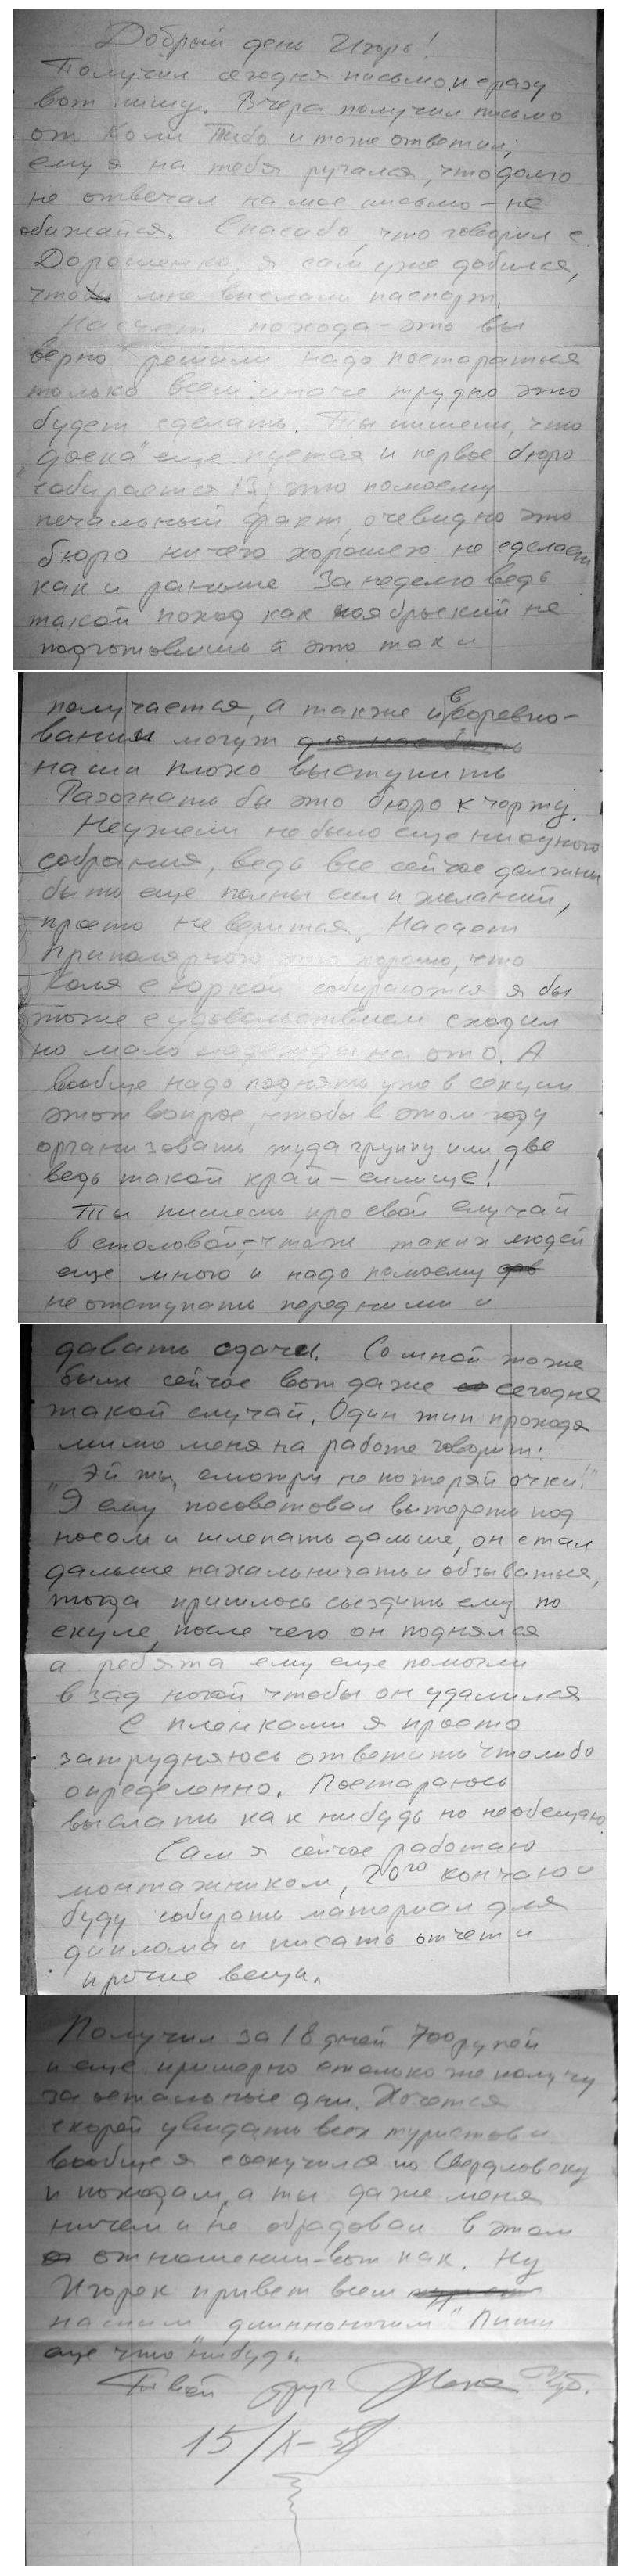 http://infodjatlov.narod.ru/fg1/images/016.jpg